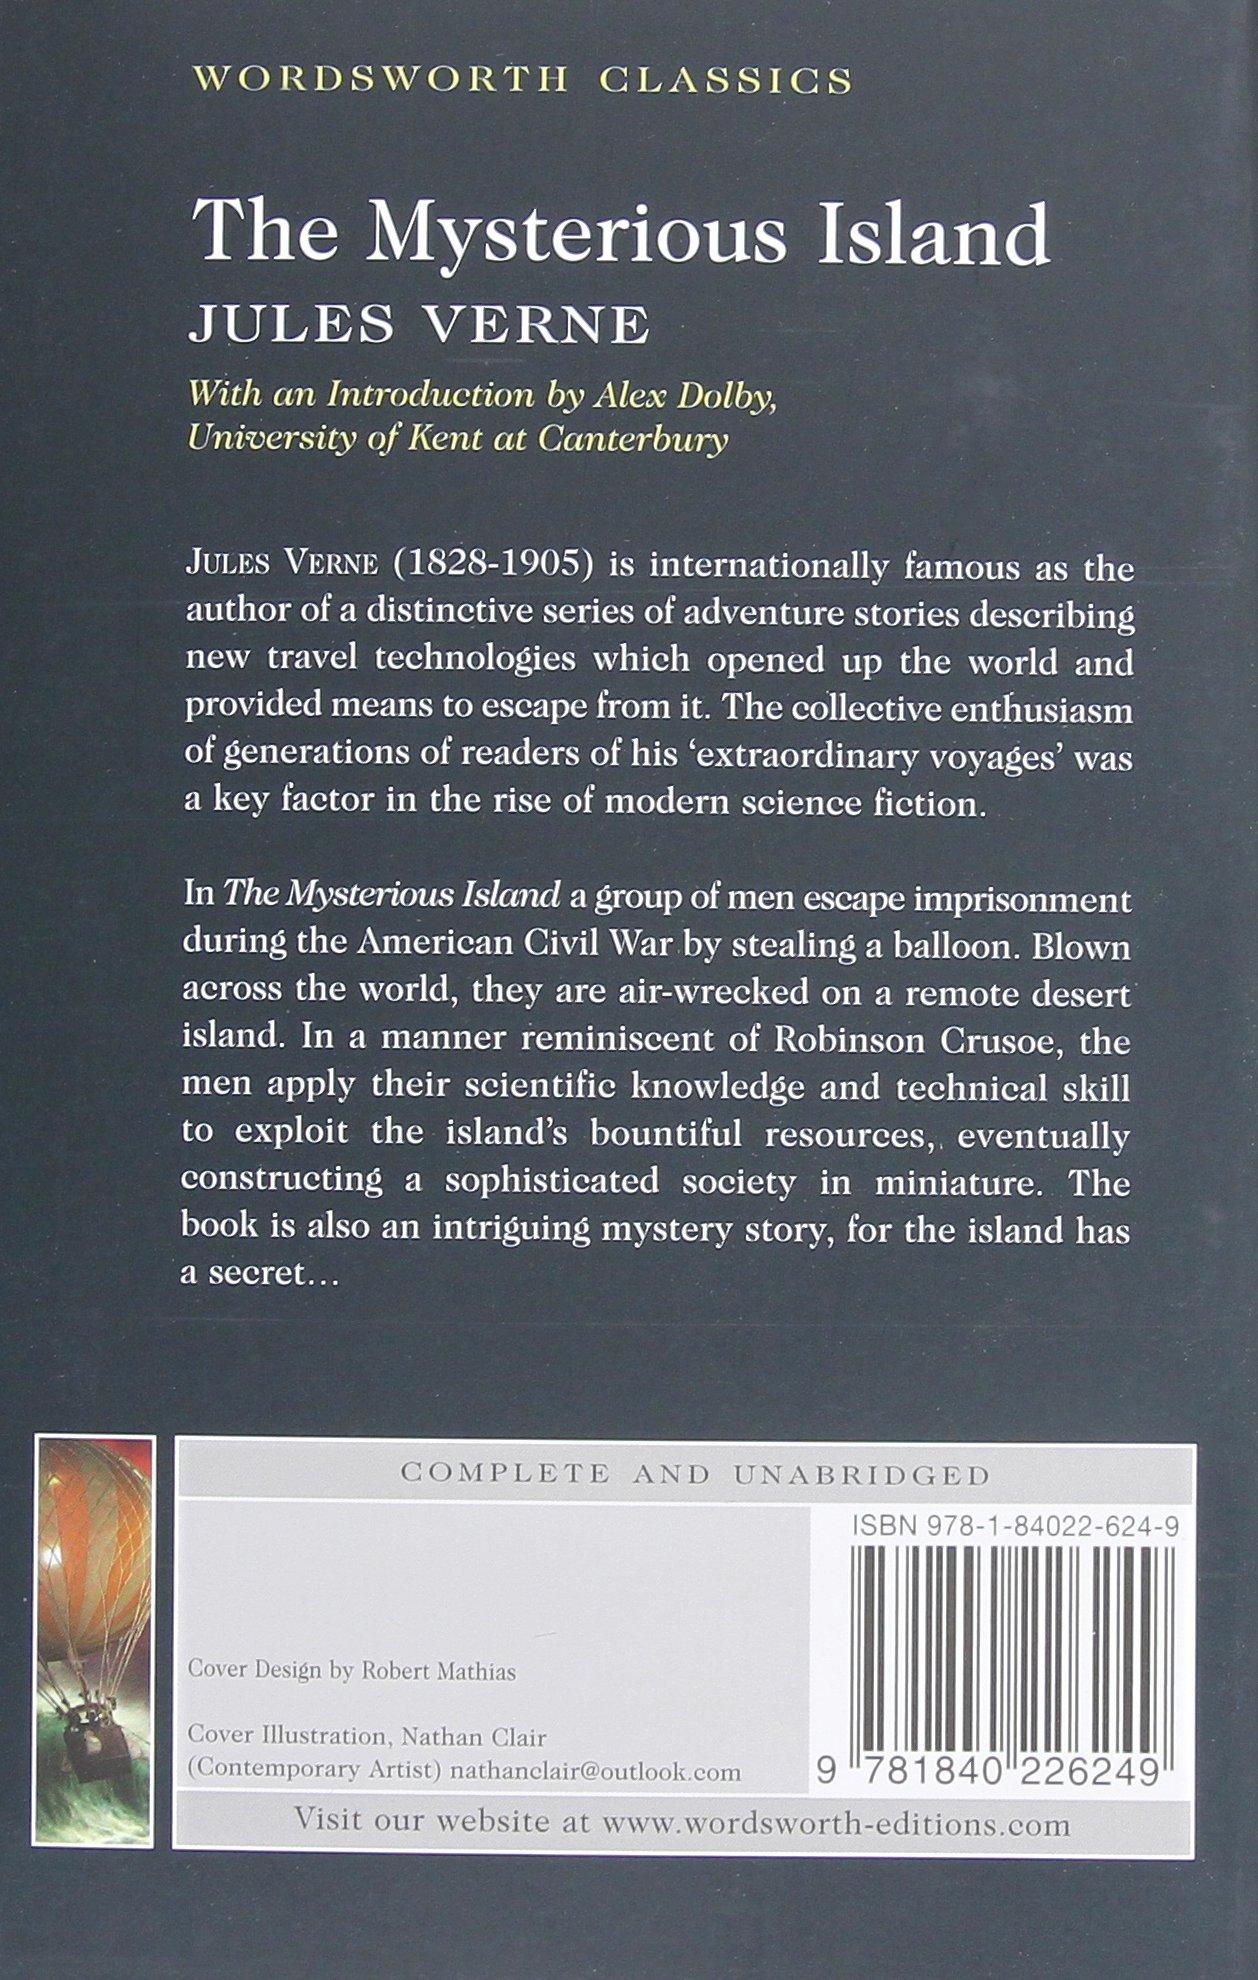 The Mysterious Island (wordsworth Classics): Jules Verne: 9781840226249:  Amazon: Books